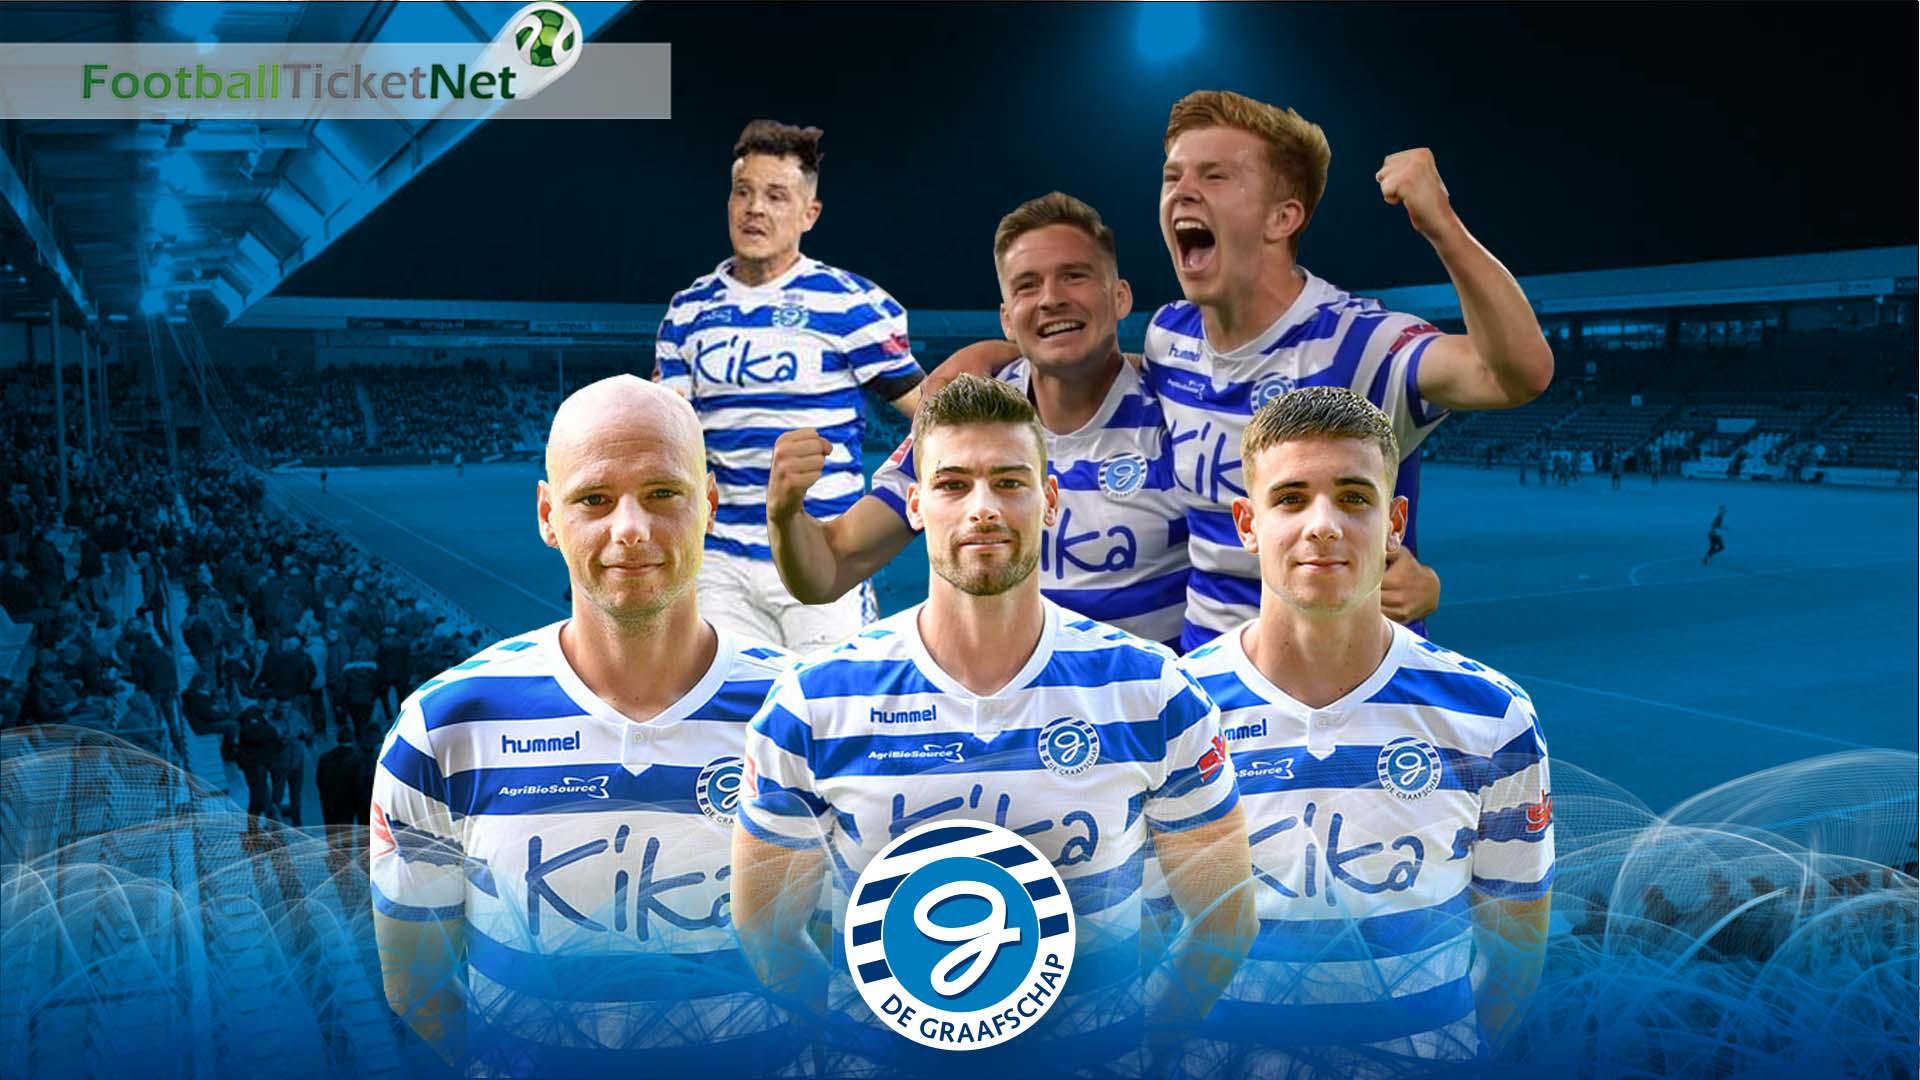 De Graafschap Tickets 2017/2018 Season